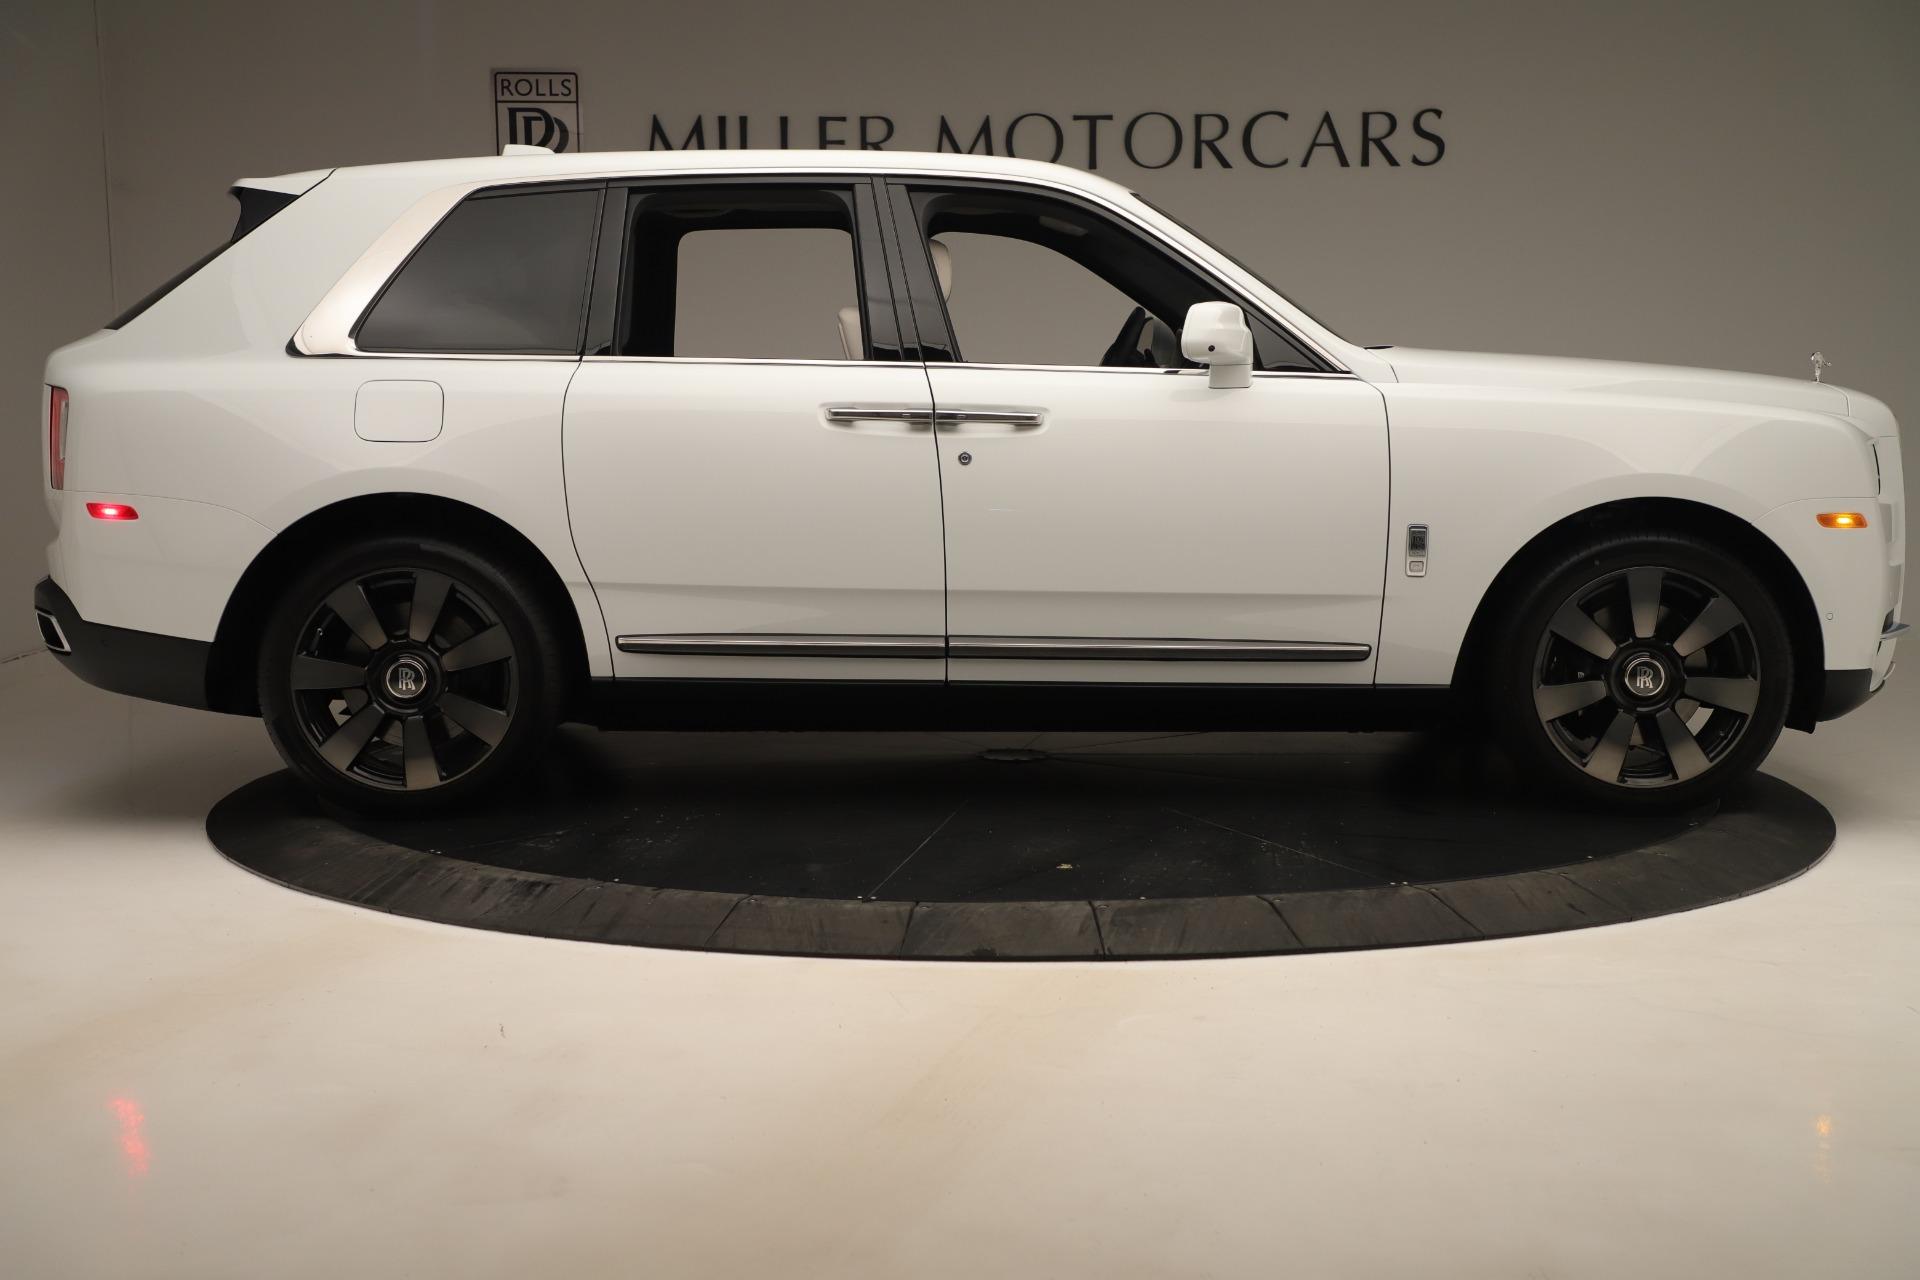 New 2019 Rolls-Royce Cullinan  For Sale In Greenwich, CT 3377_p7